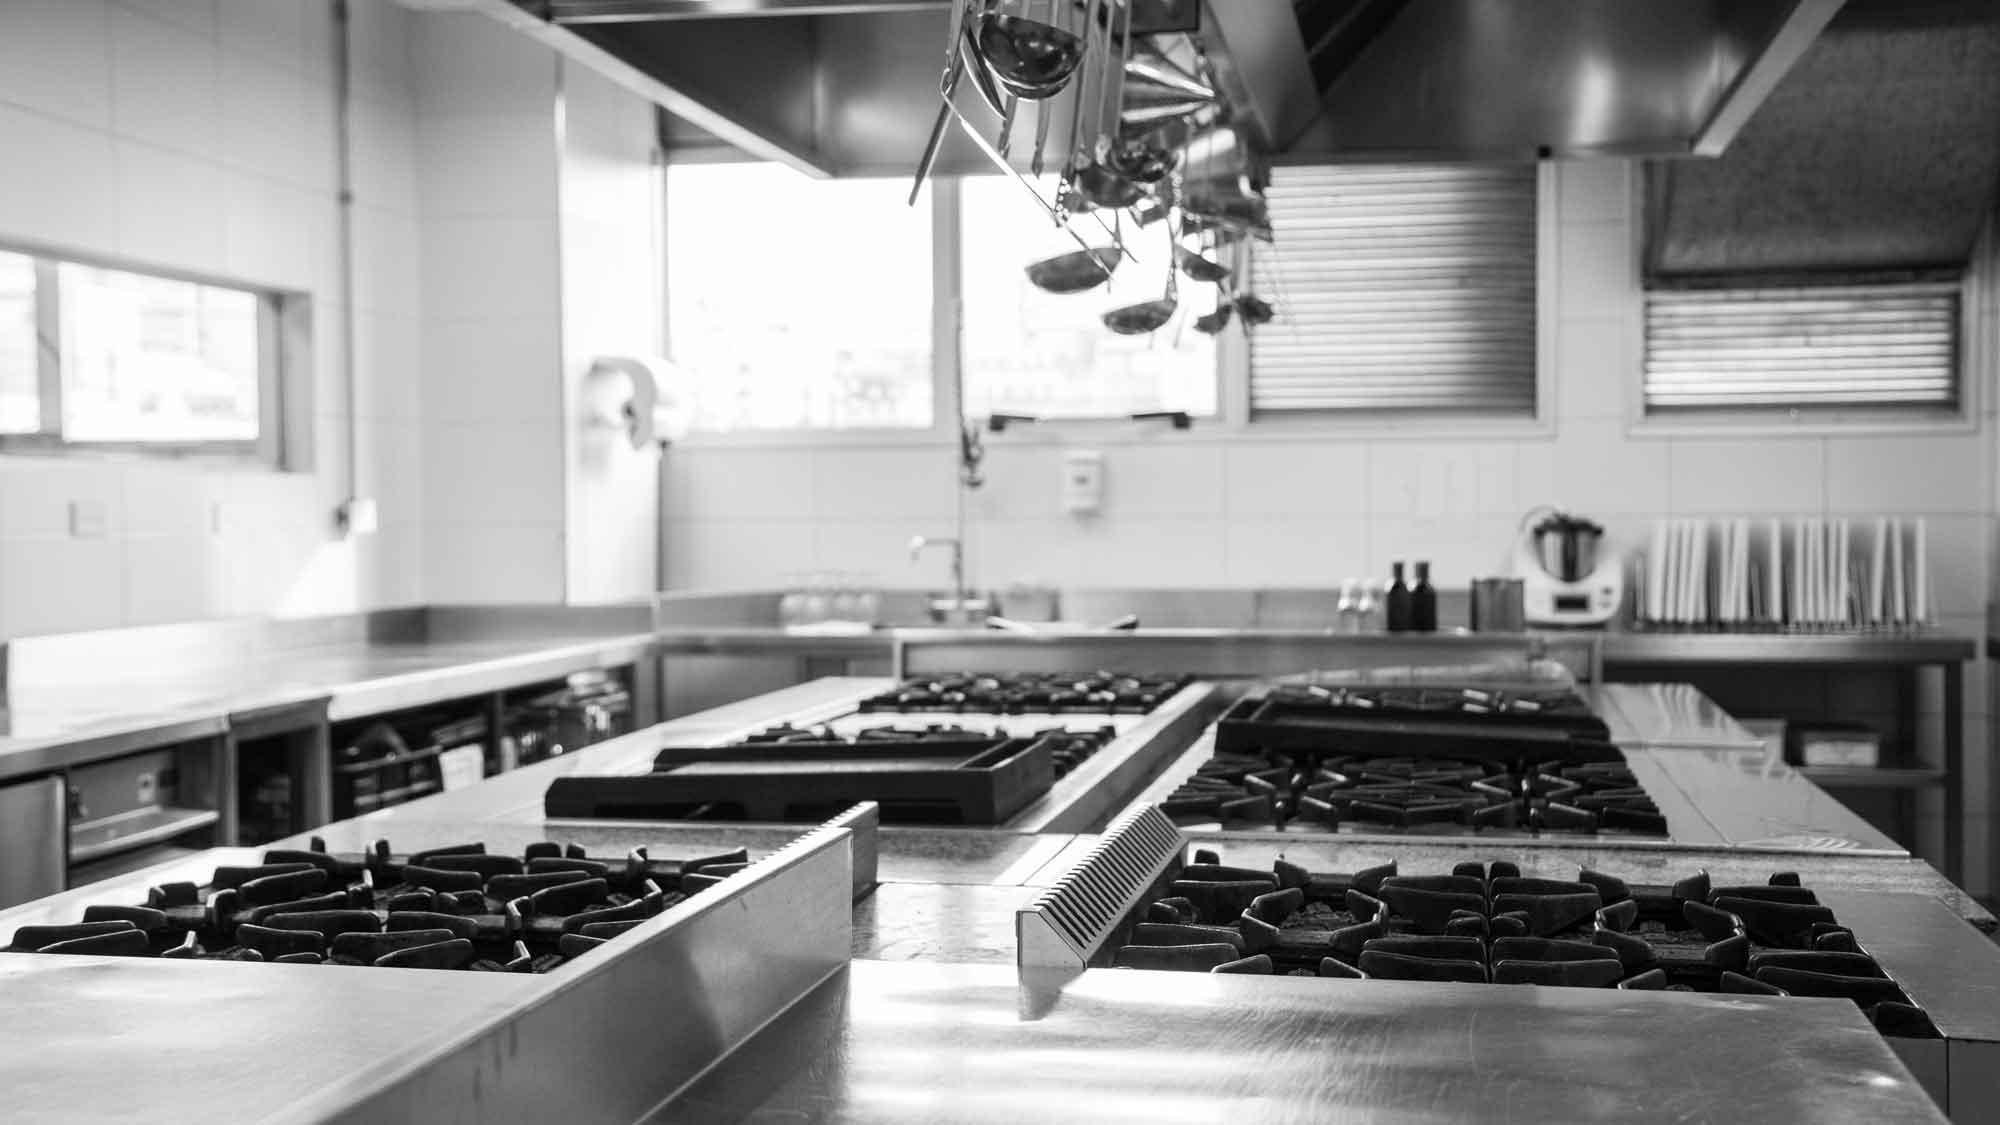 catering equipment repairs essex maintenance leigh on sea kitchen 5